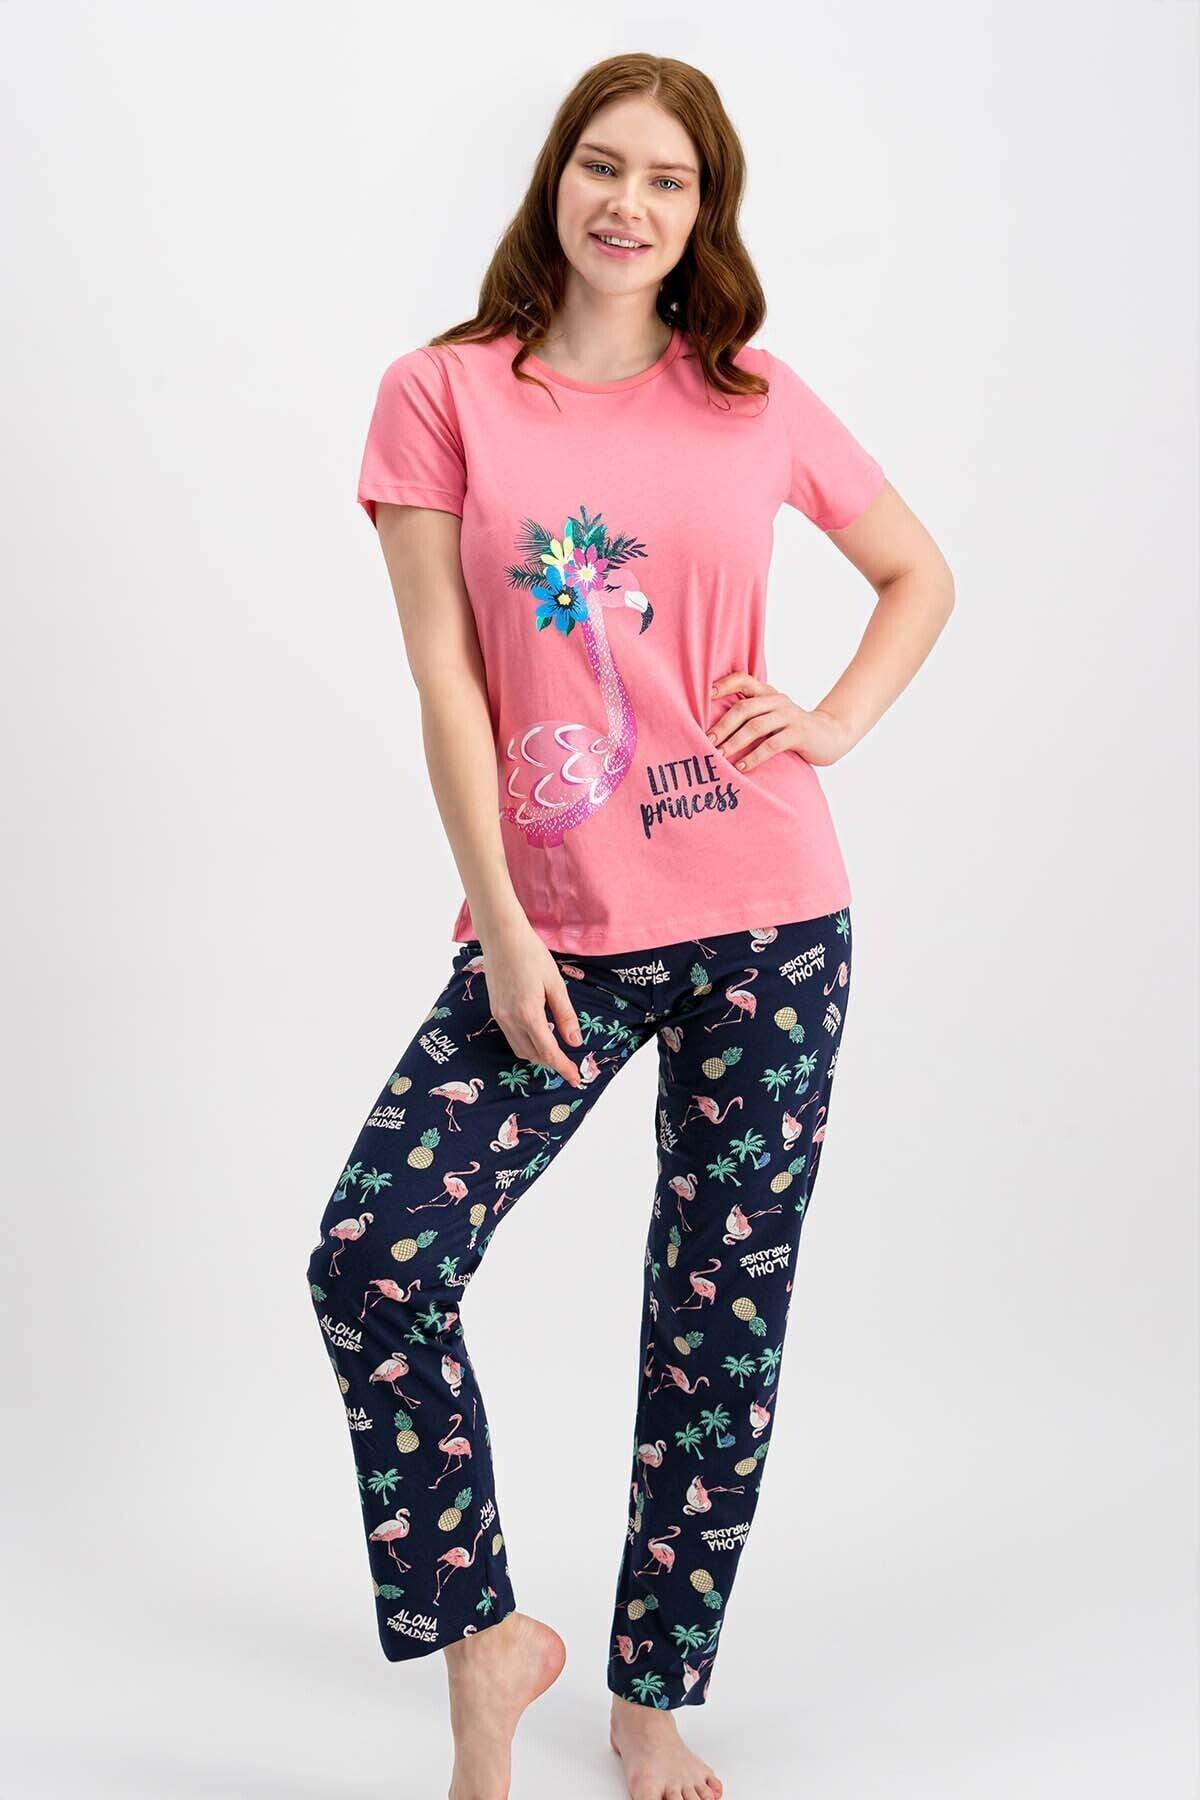 ROLY POLY Kadın Şeker Pembe Kısa Kollu Pijama Takımı 1